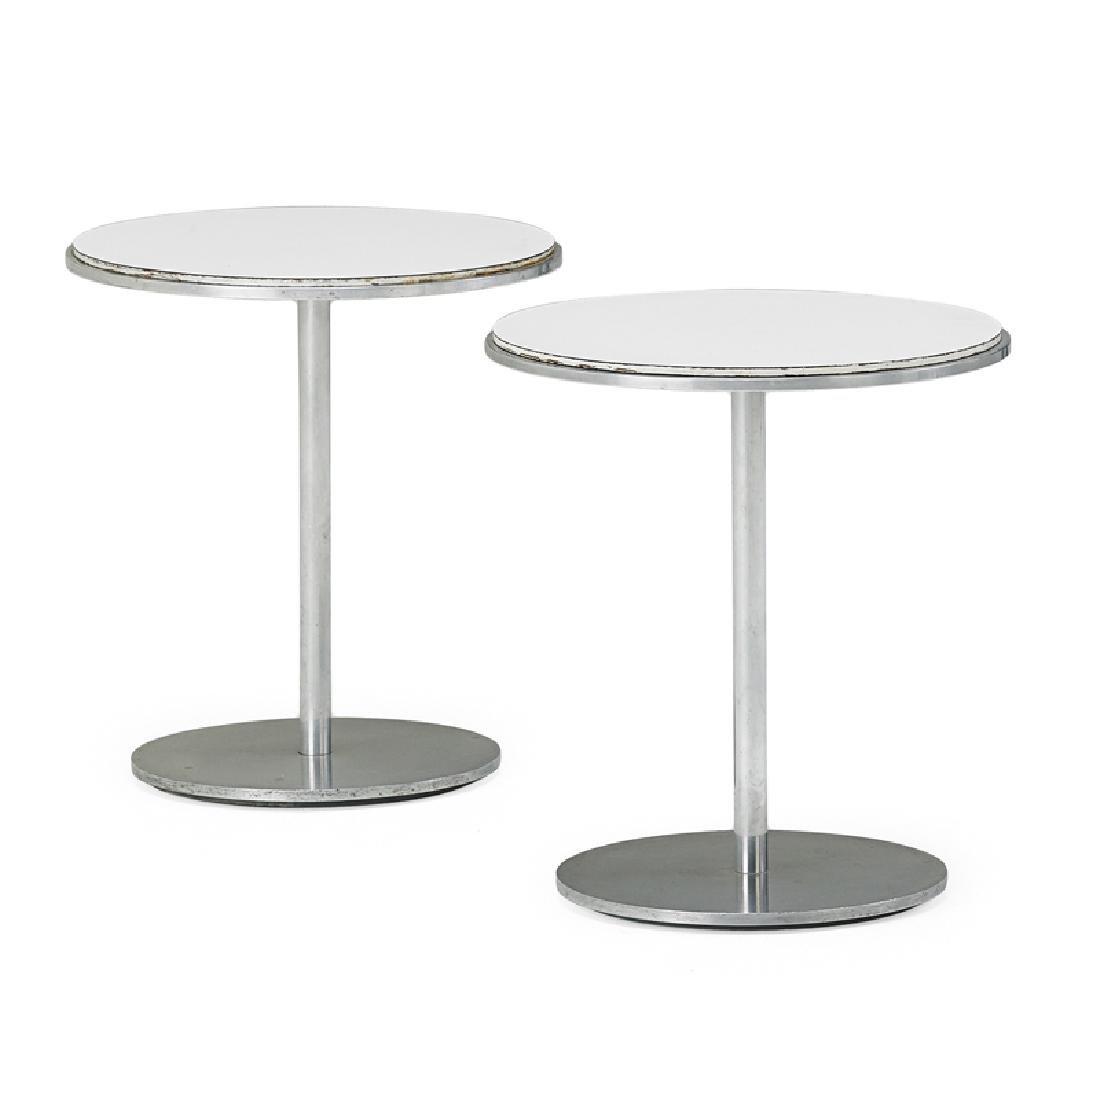 DAVID ALLEN; WARD BENNETT Pair of side tables